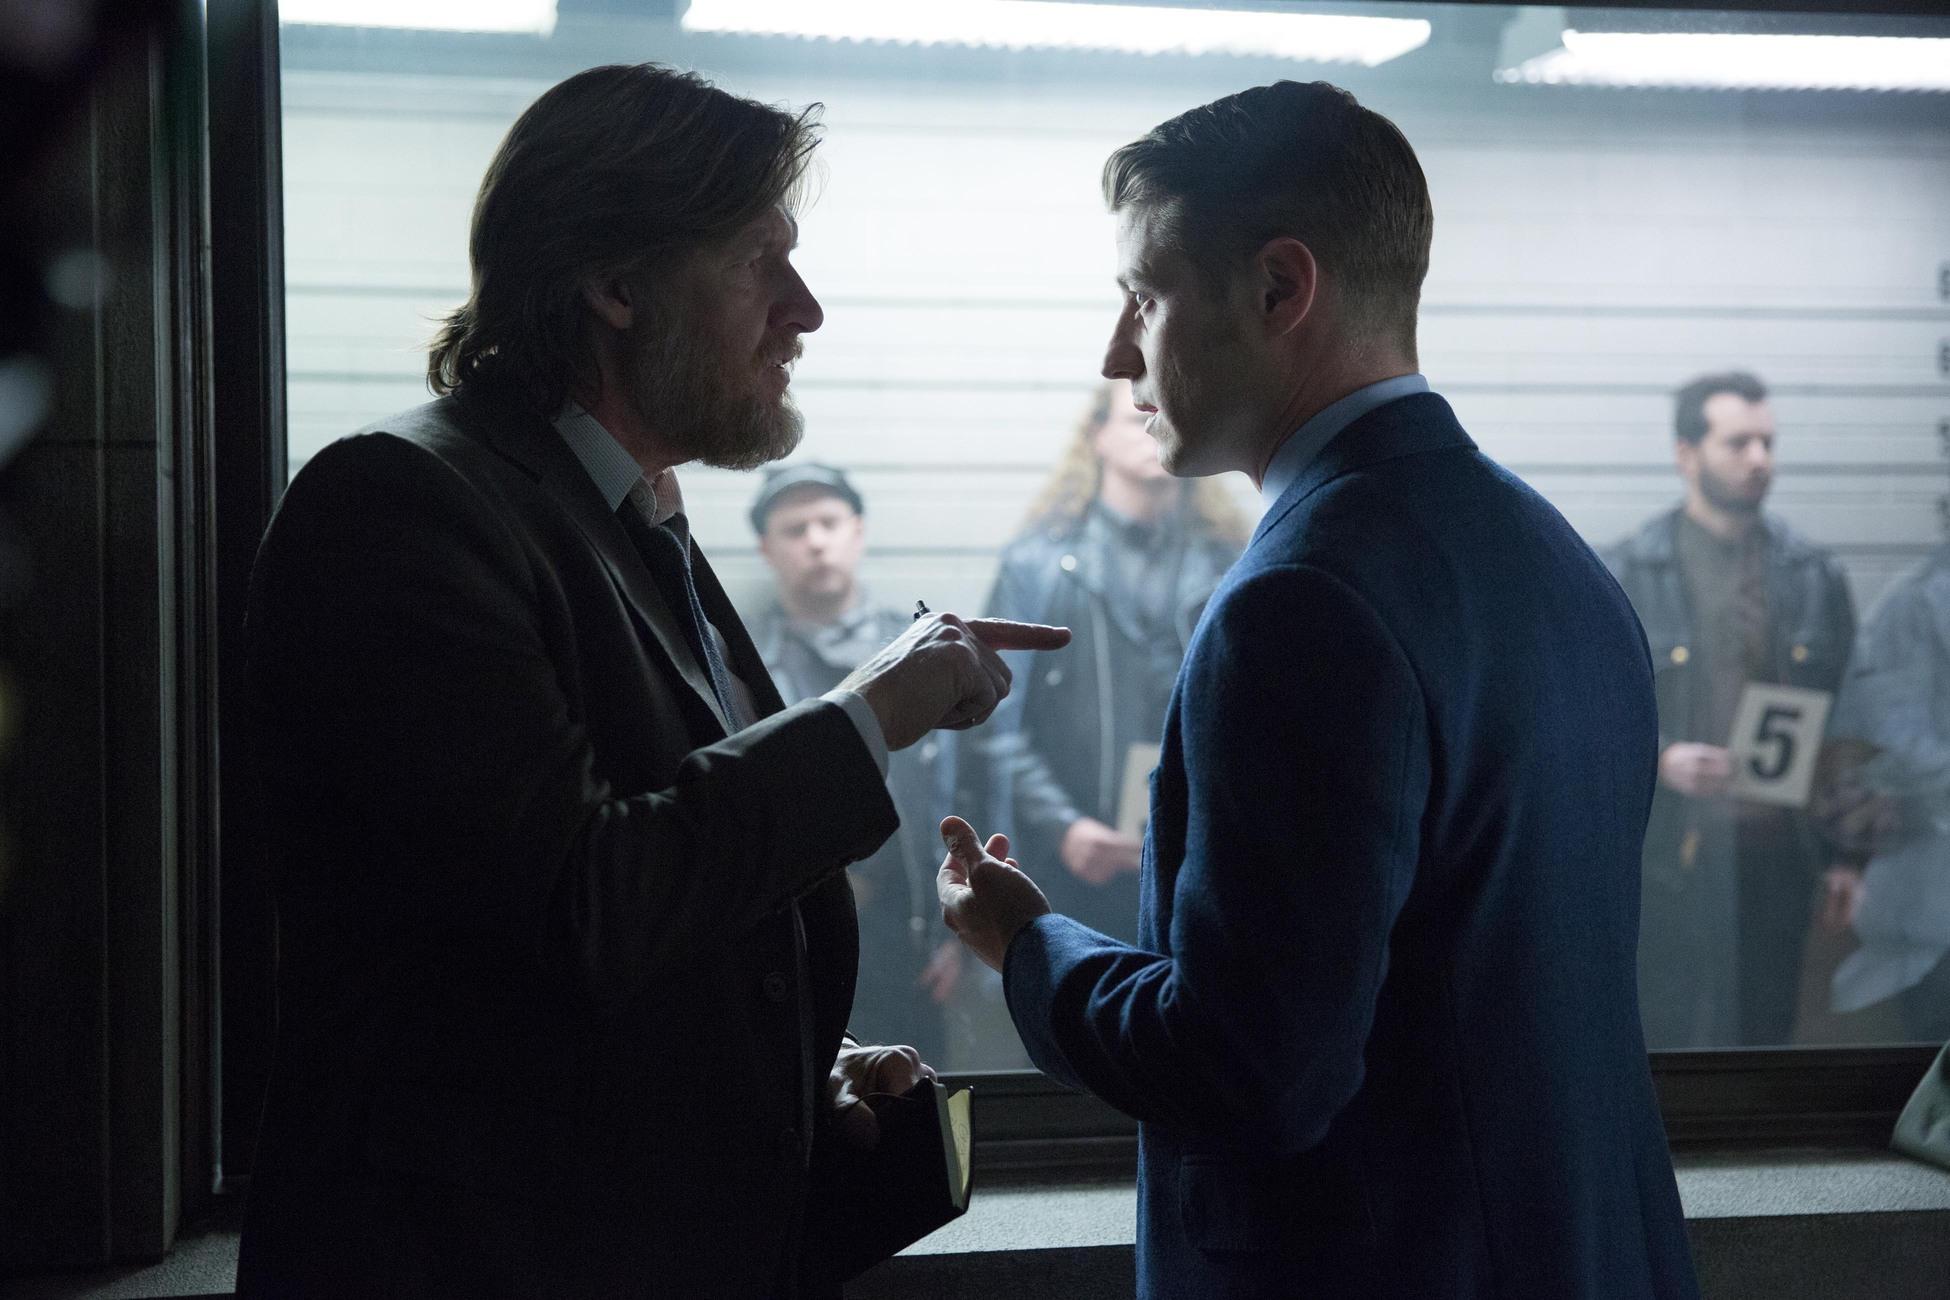 Gotham - Episode 1.17 - Red ঘোমটা